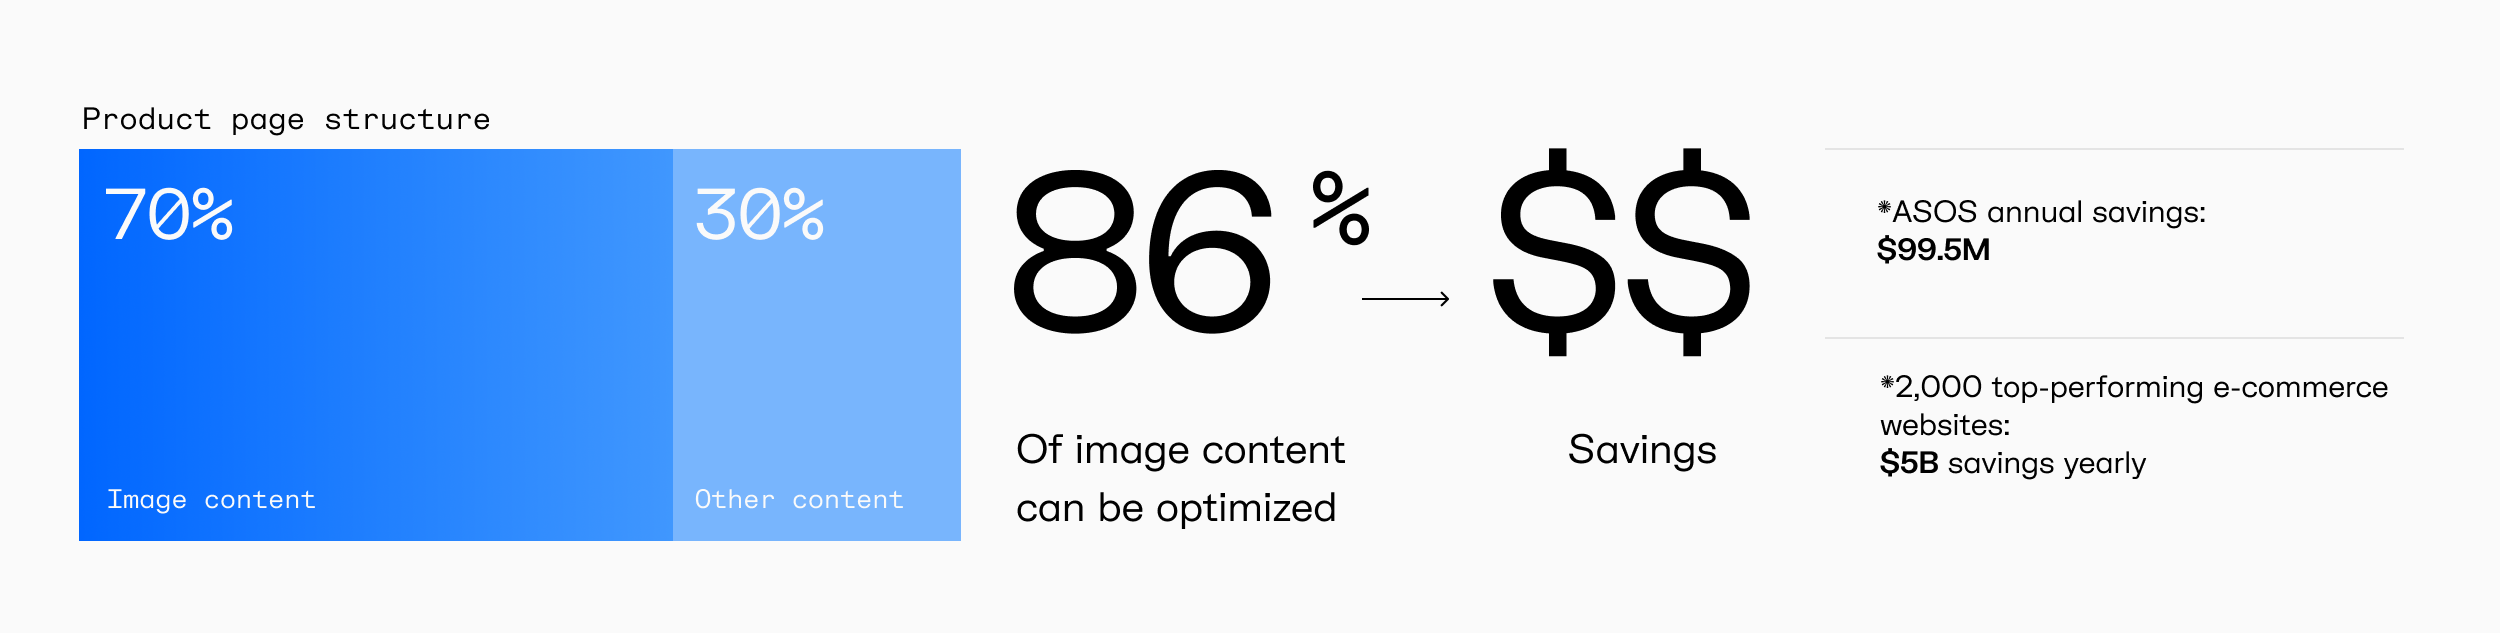 image optimization statistics